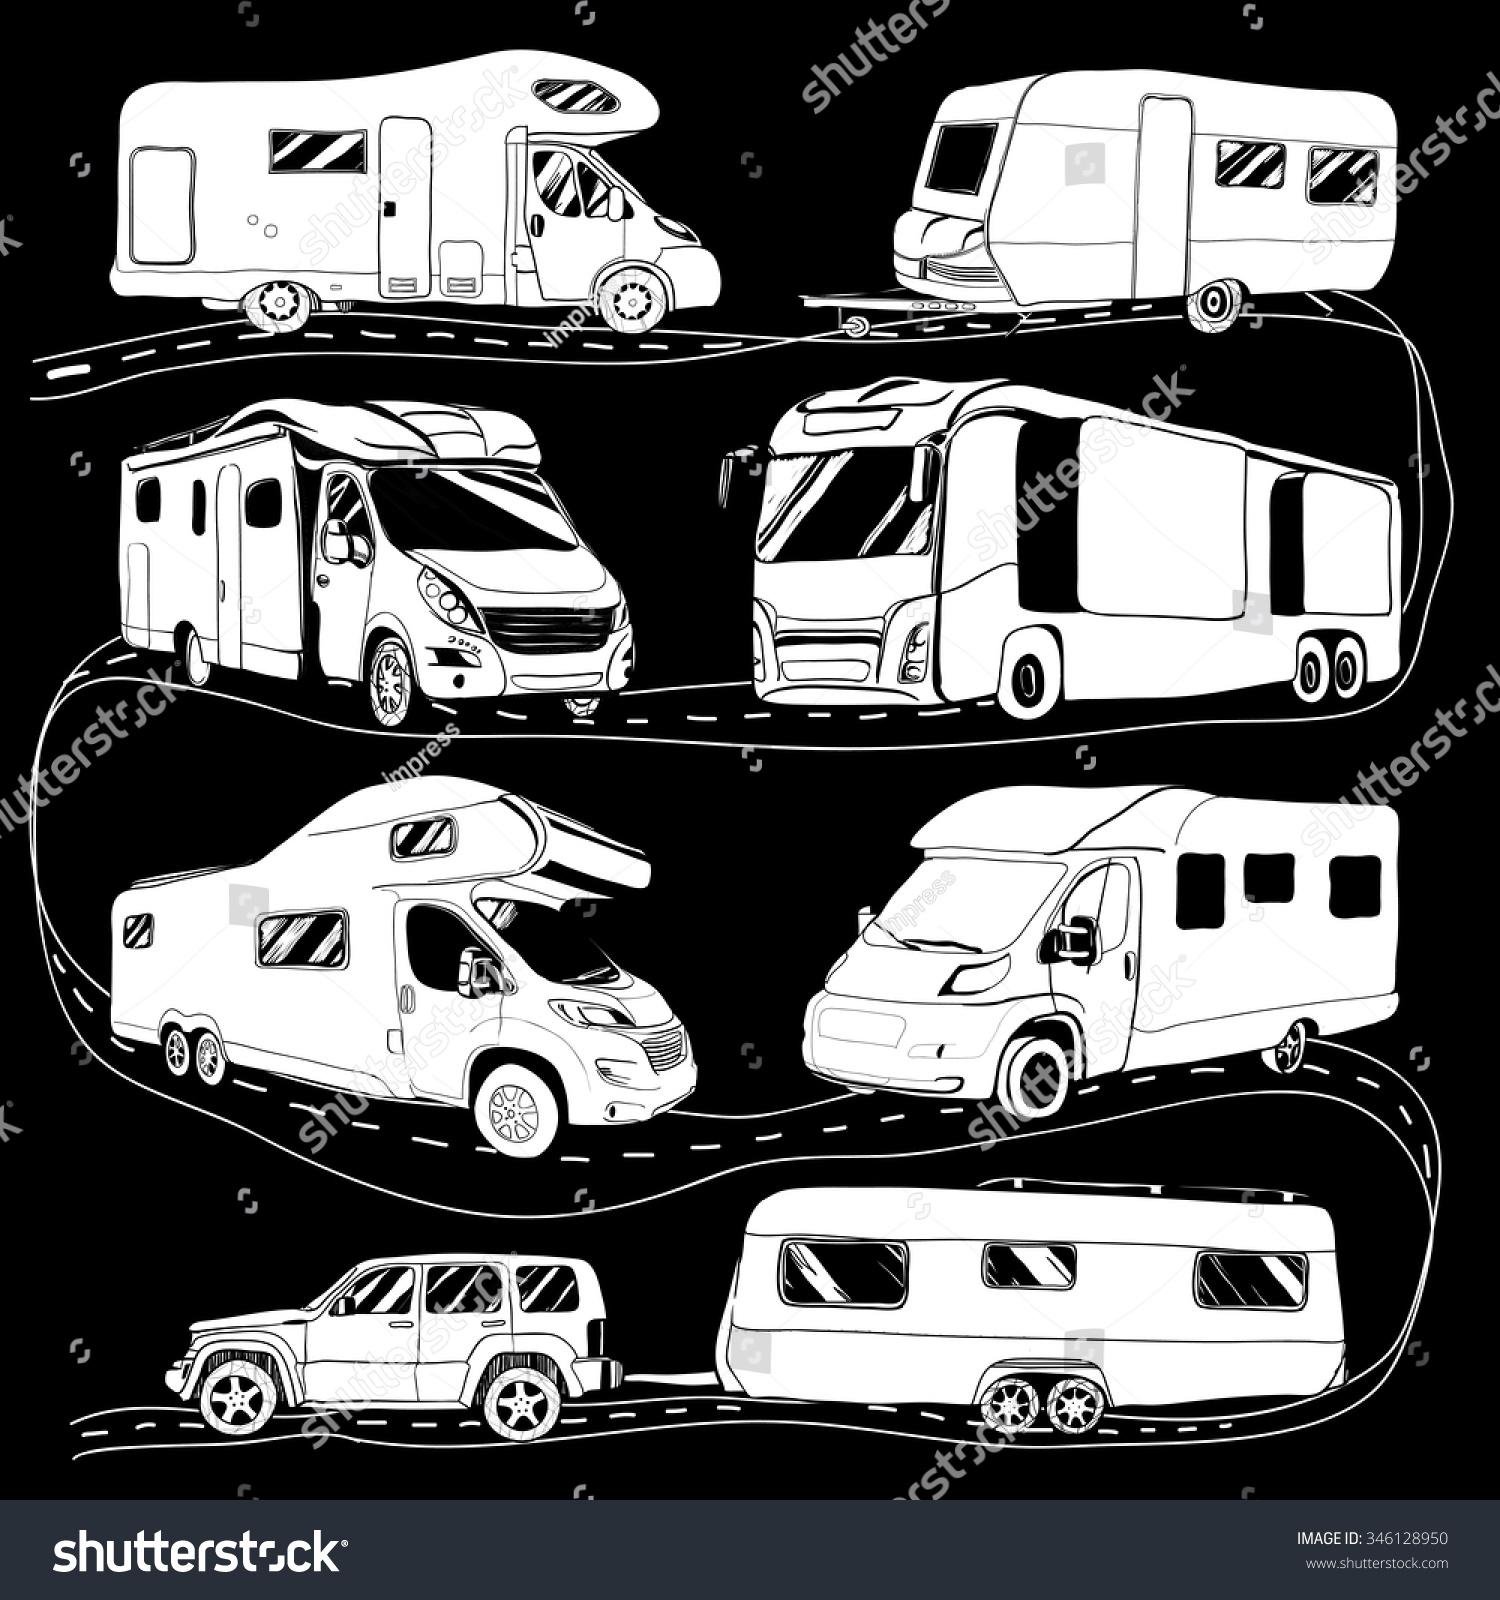 Cars Recreational Vehicles Camper Vans Caravans Icons Vector Illustration Motorhome On Black Background